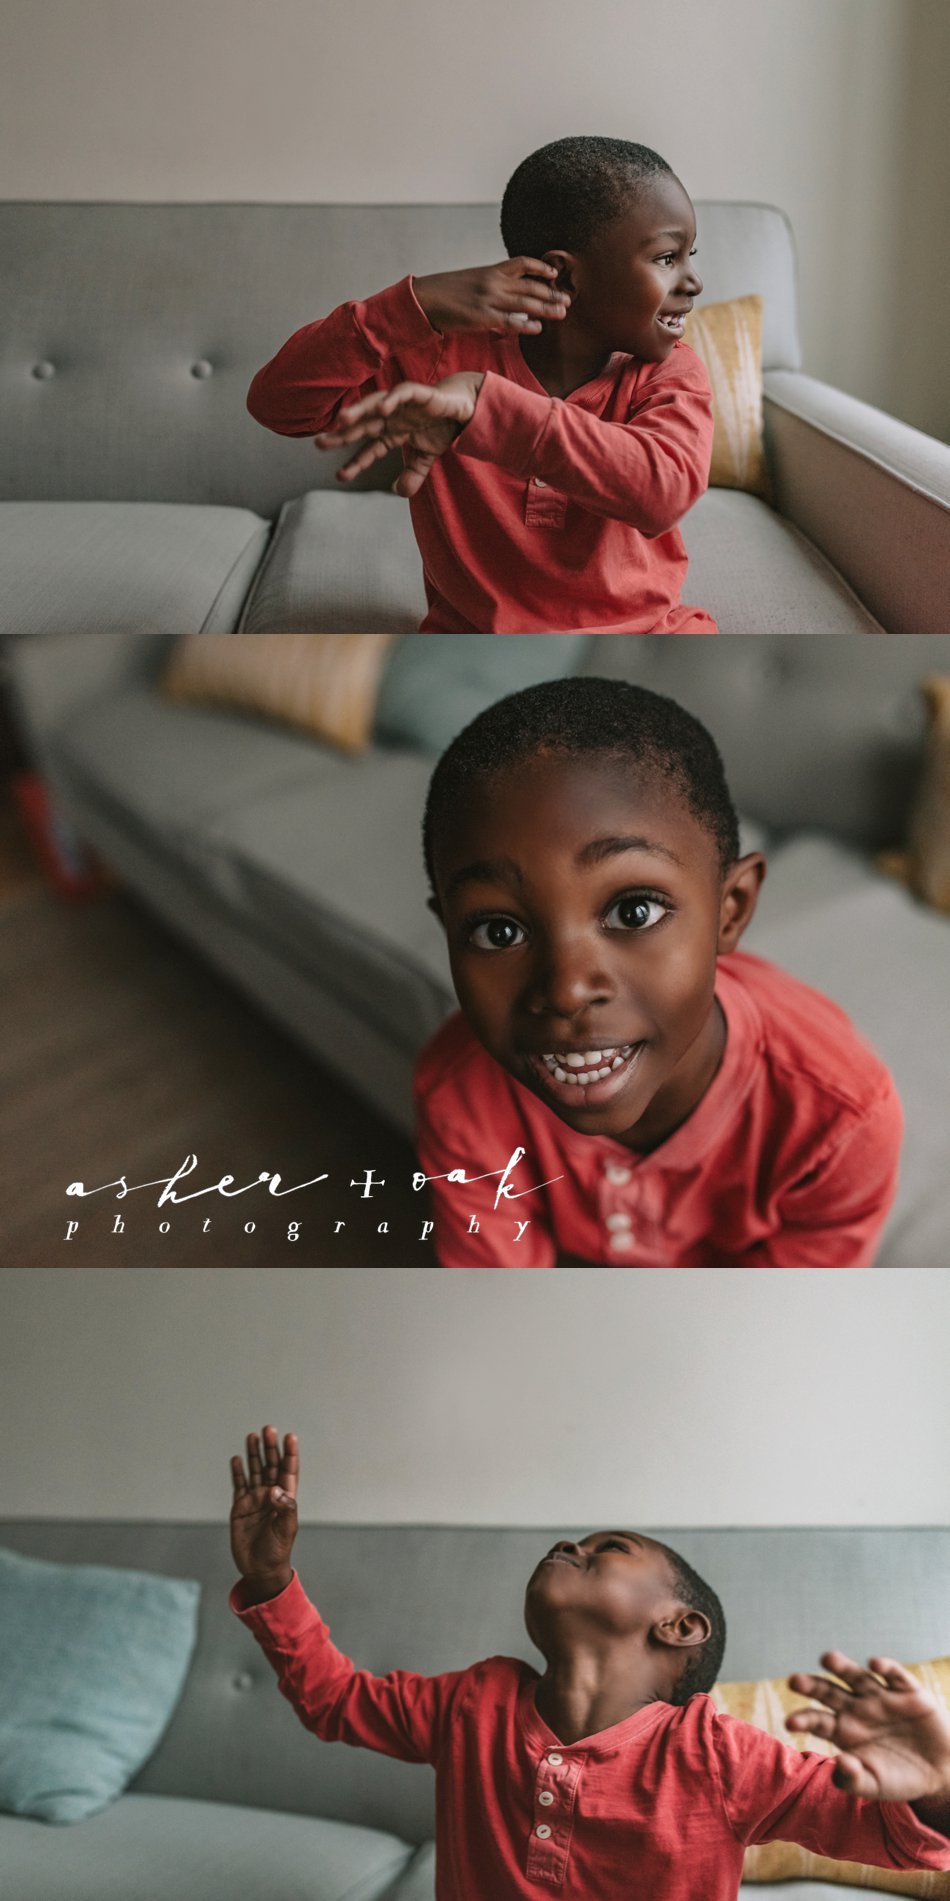 Boston-Cambridge-Massachusetts-Portrait-Family-Photographer-Studio-Natural-Light-Modern-Minimalist-Funny-Kid-Cute-Itoka-5.jpg